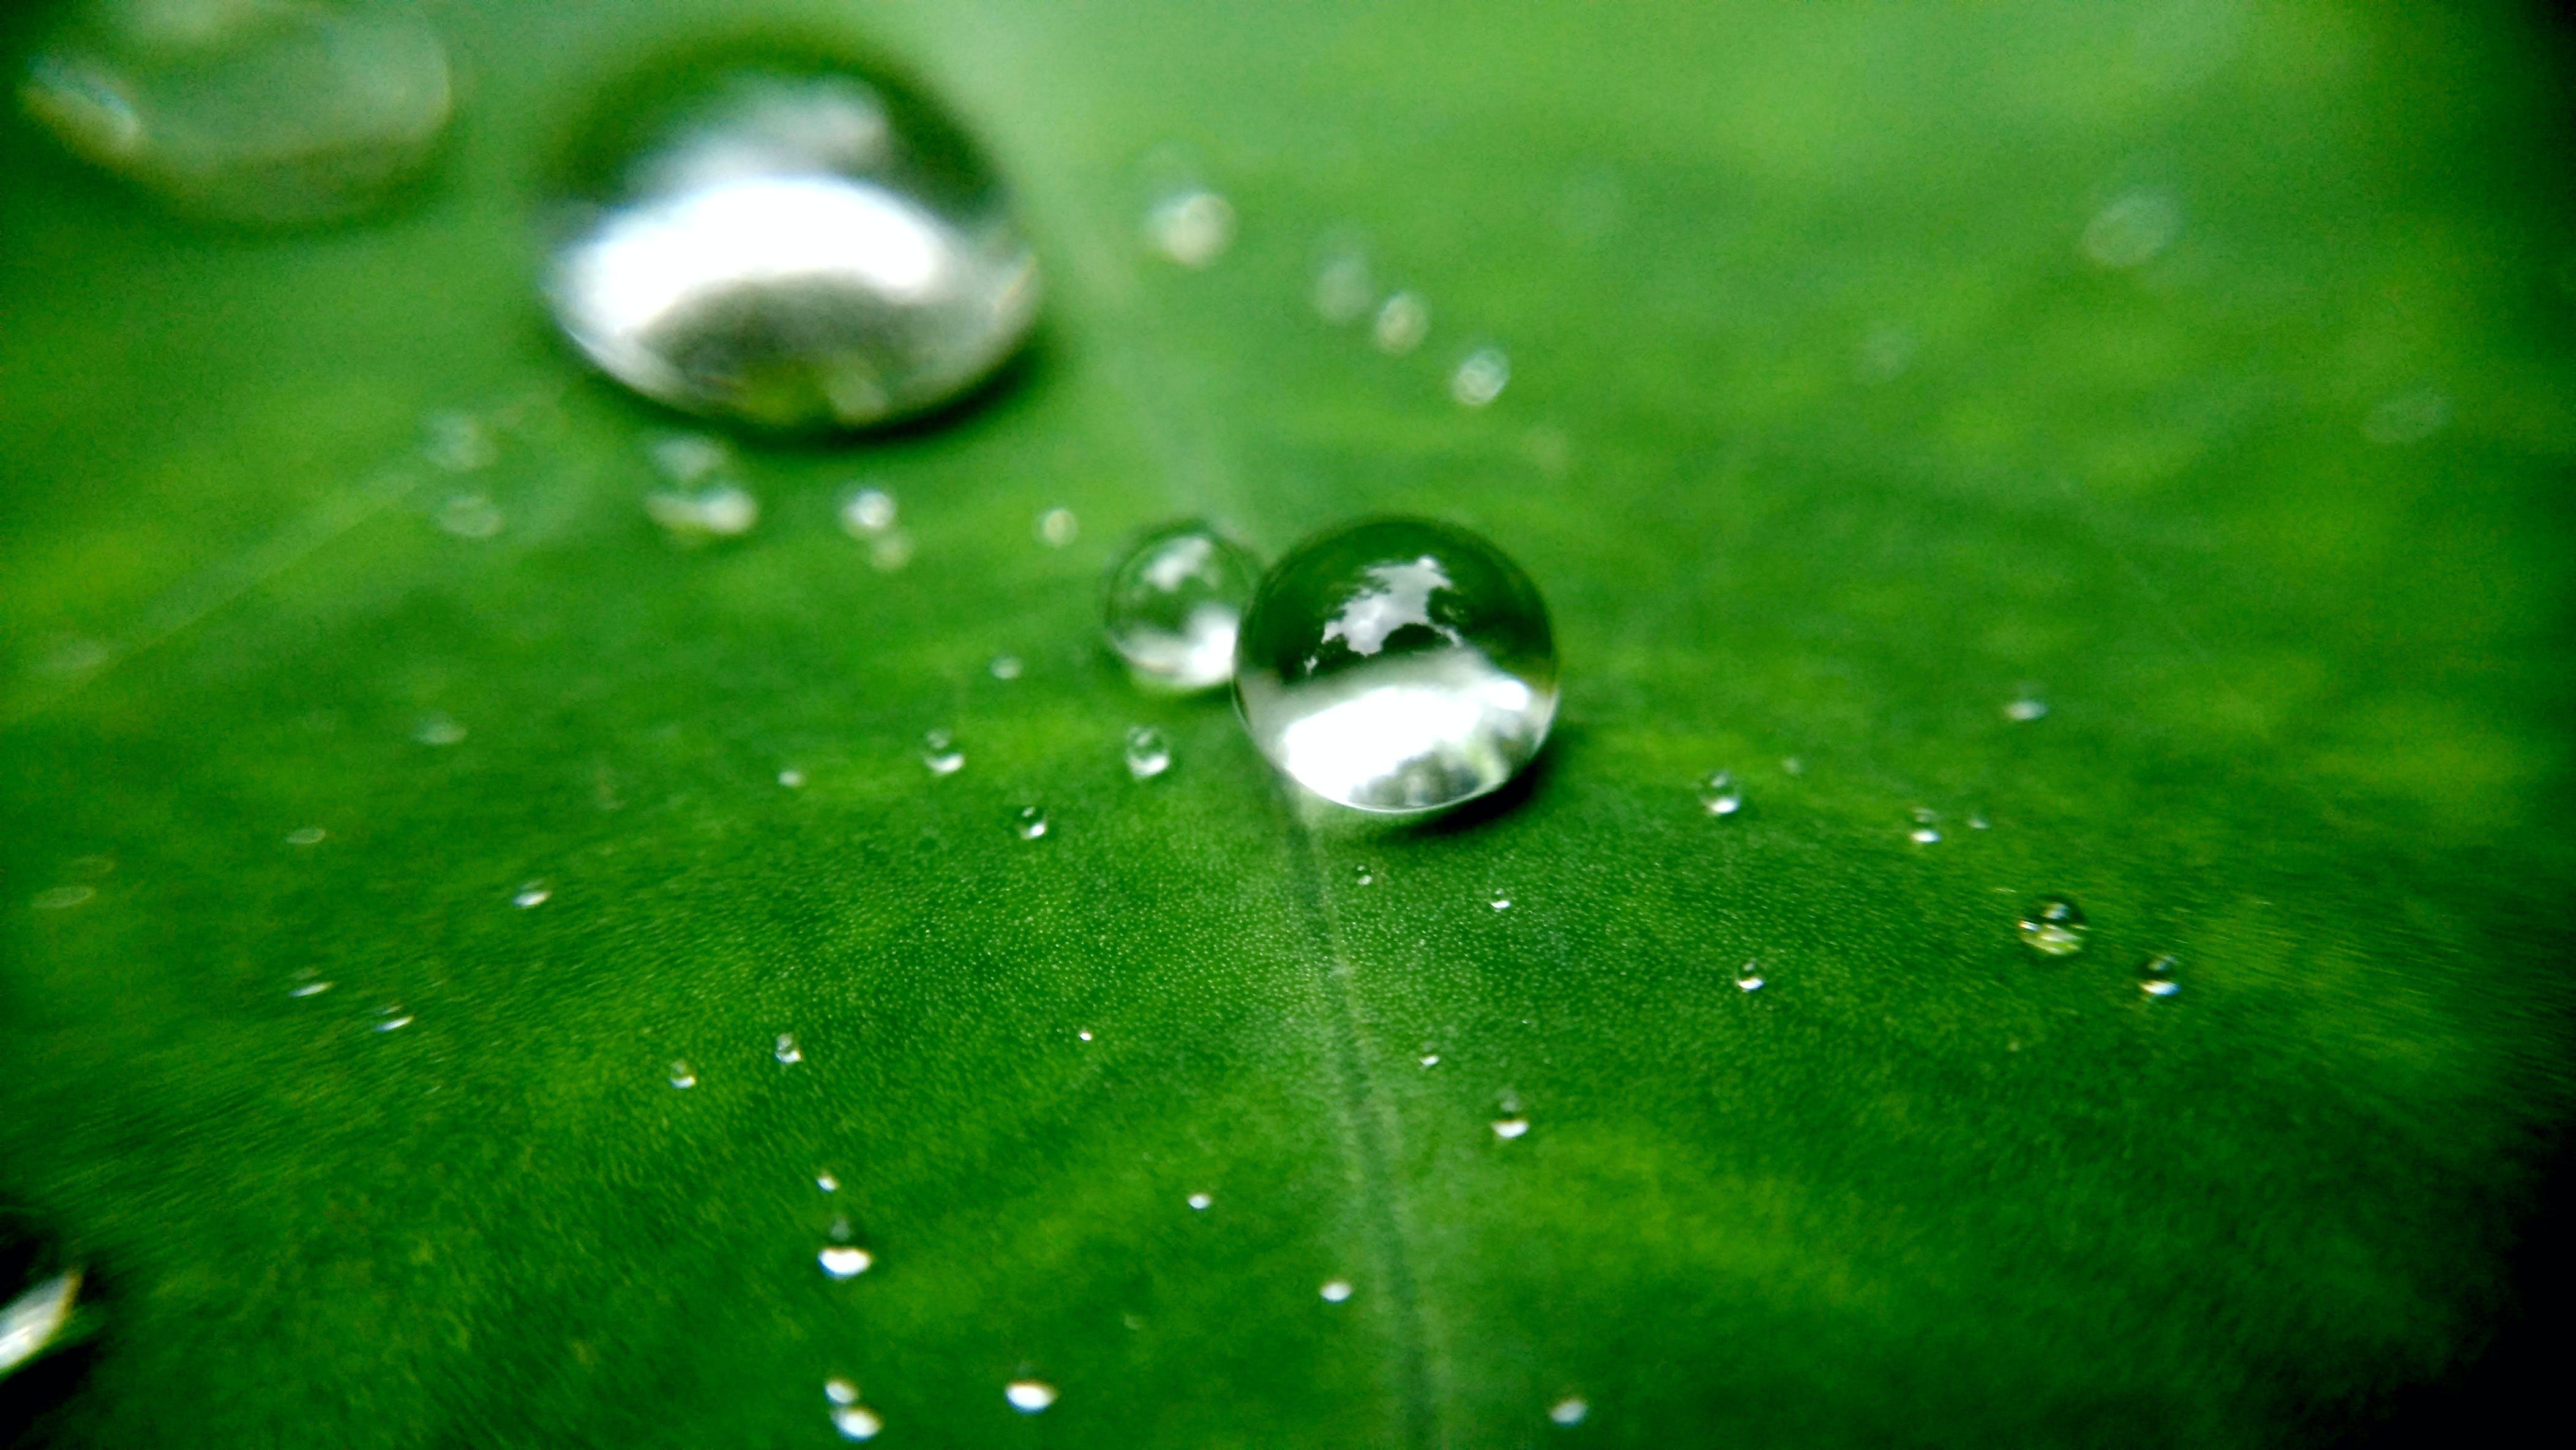 Free stock photo of drop of water, drops of water, underwater, water